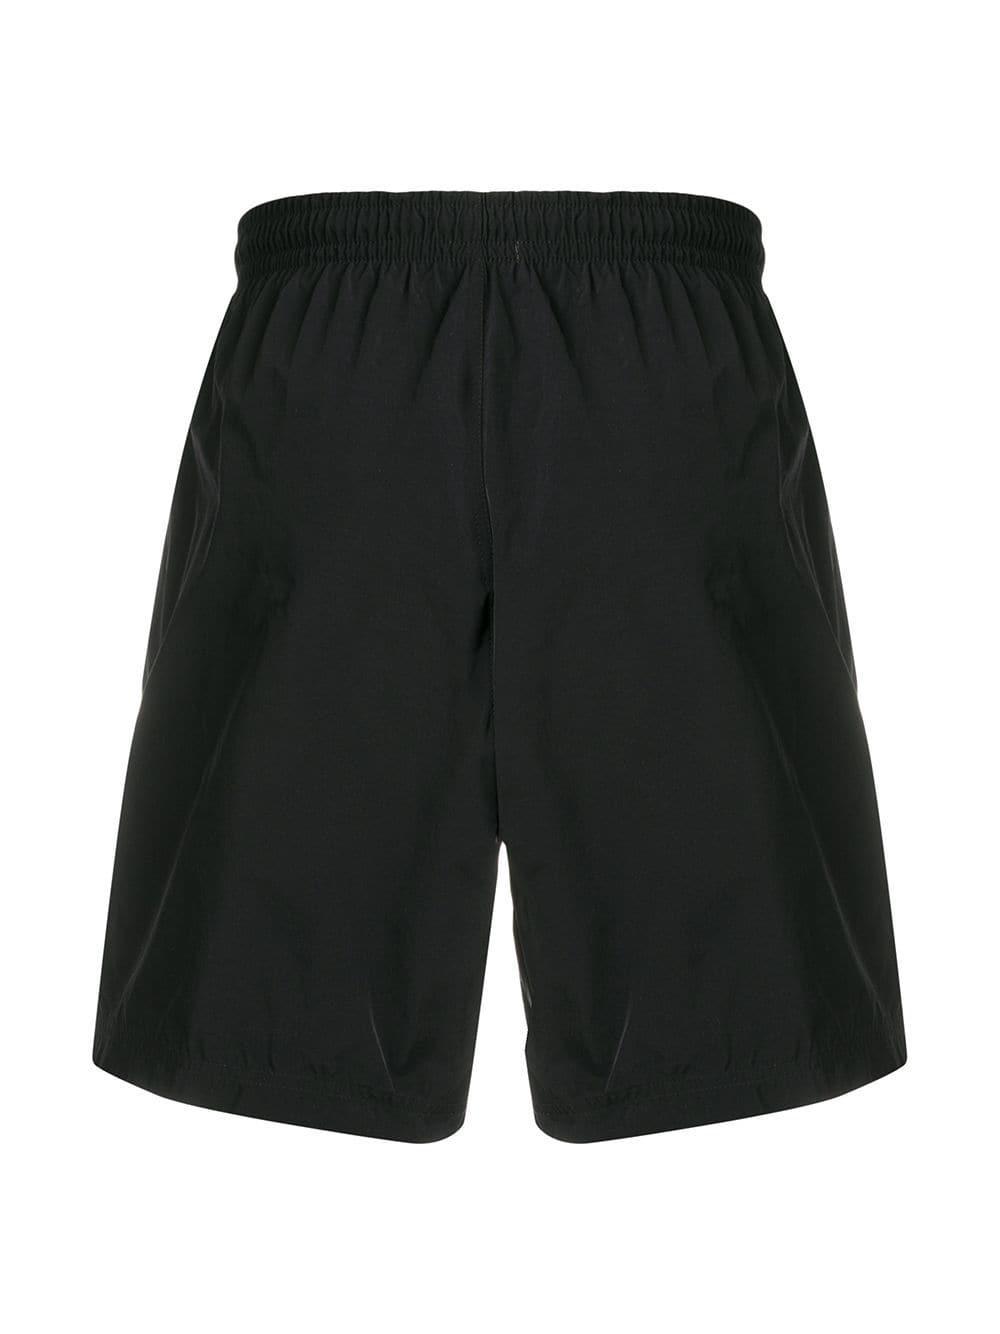 76d4b1b33a Alexander McQueen Front Skull Printed Swim Shorts in Black for Men - Lyst